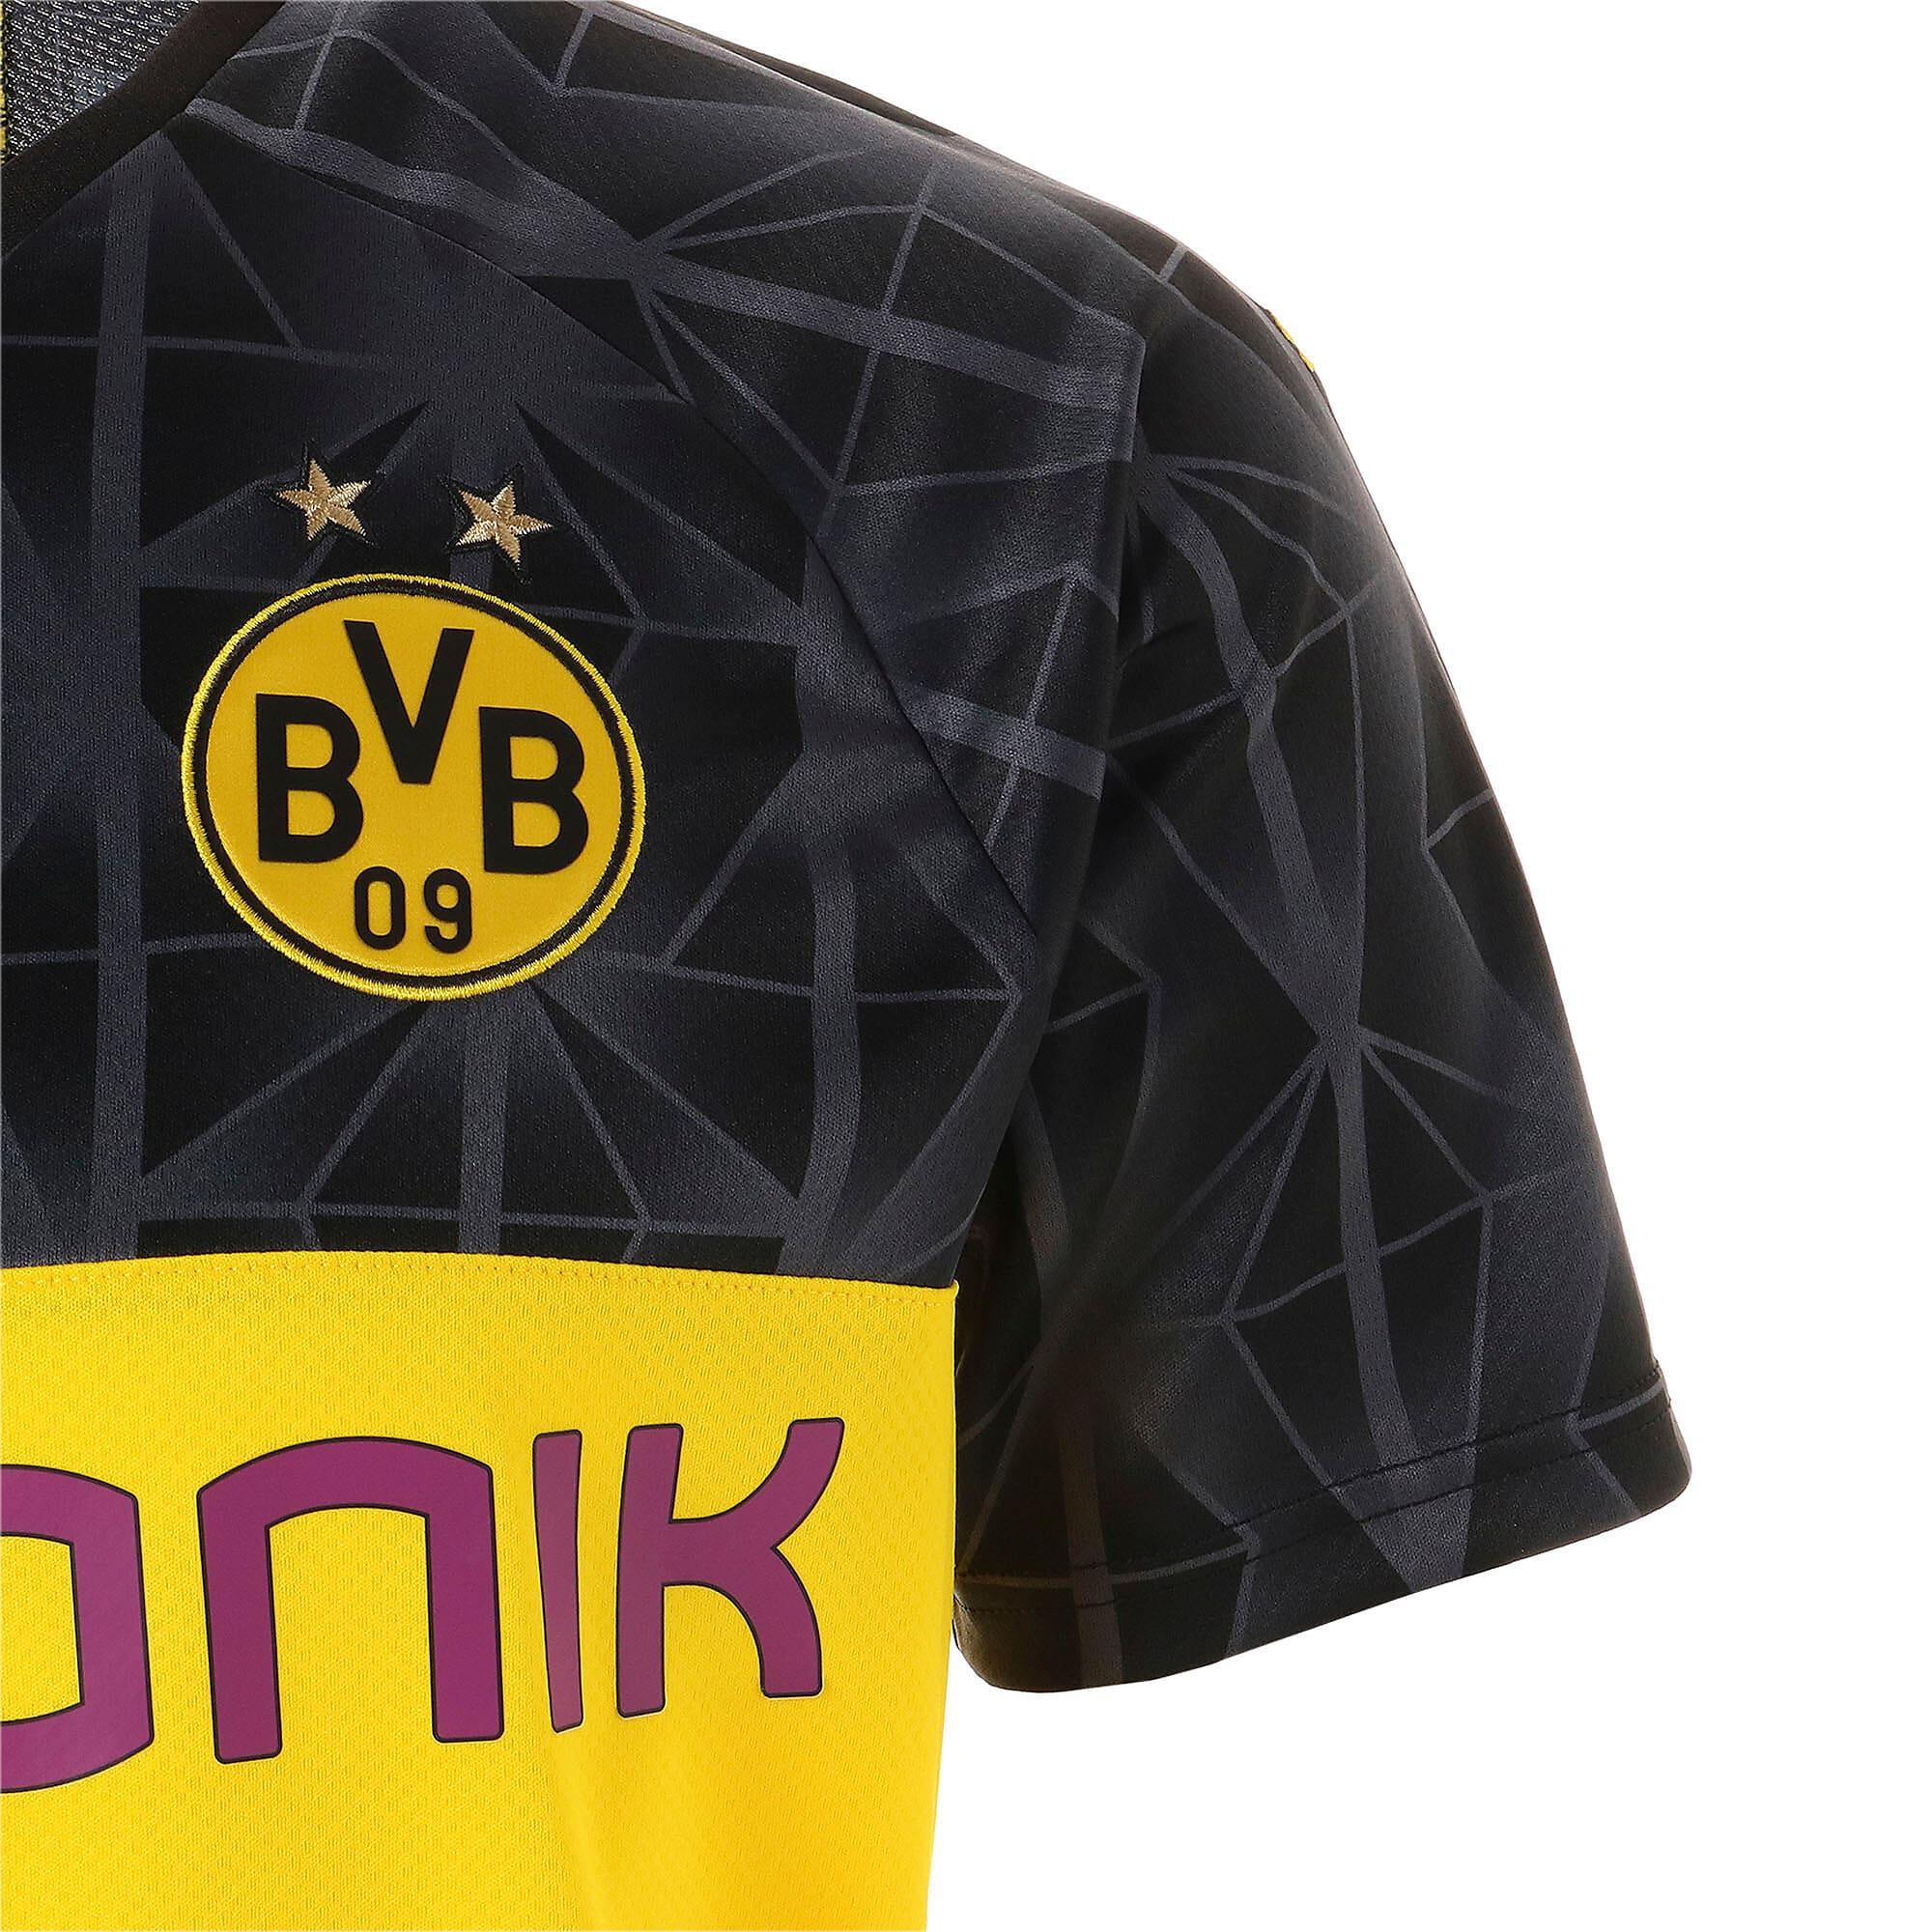 Thumbnail 5 of ドルトムント BVB SS カップ レプリカシャツ (半袖), Cyber Yellow-Puma Black, medium-JPN